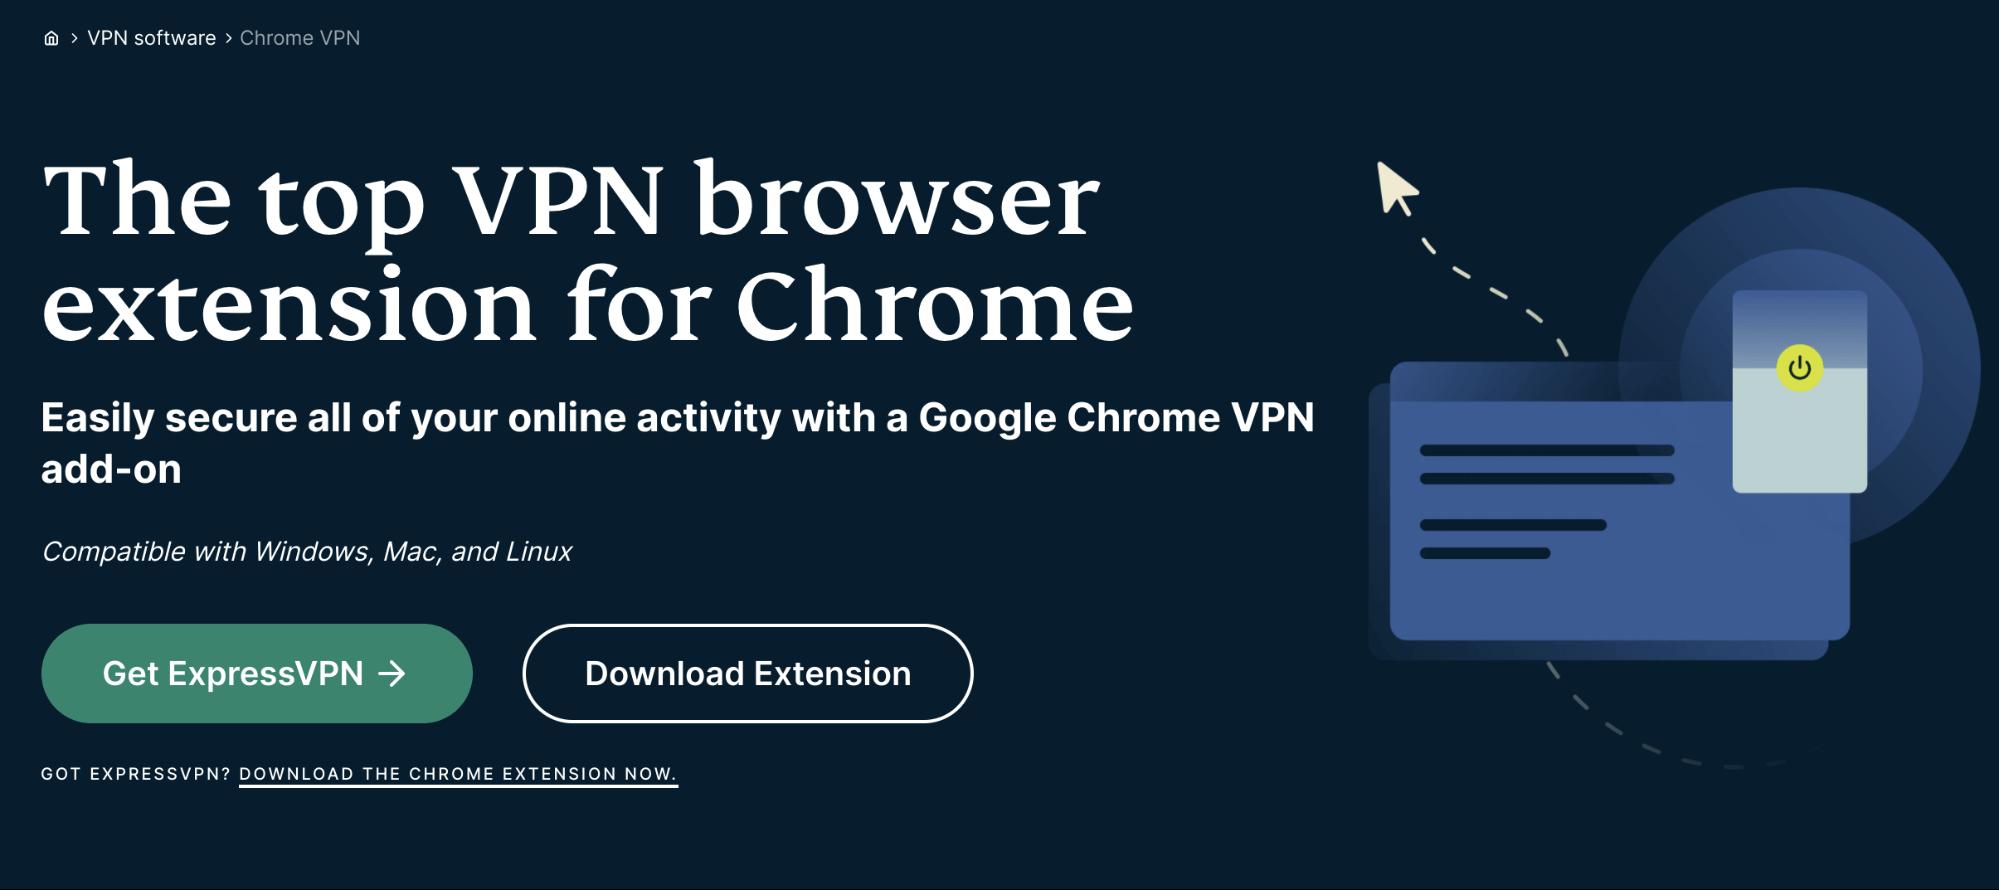 ExpressVPN Chrome VPN extension